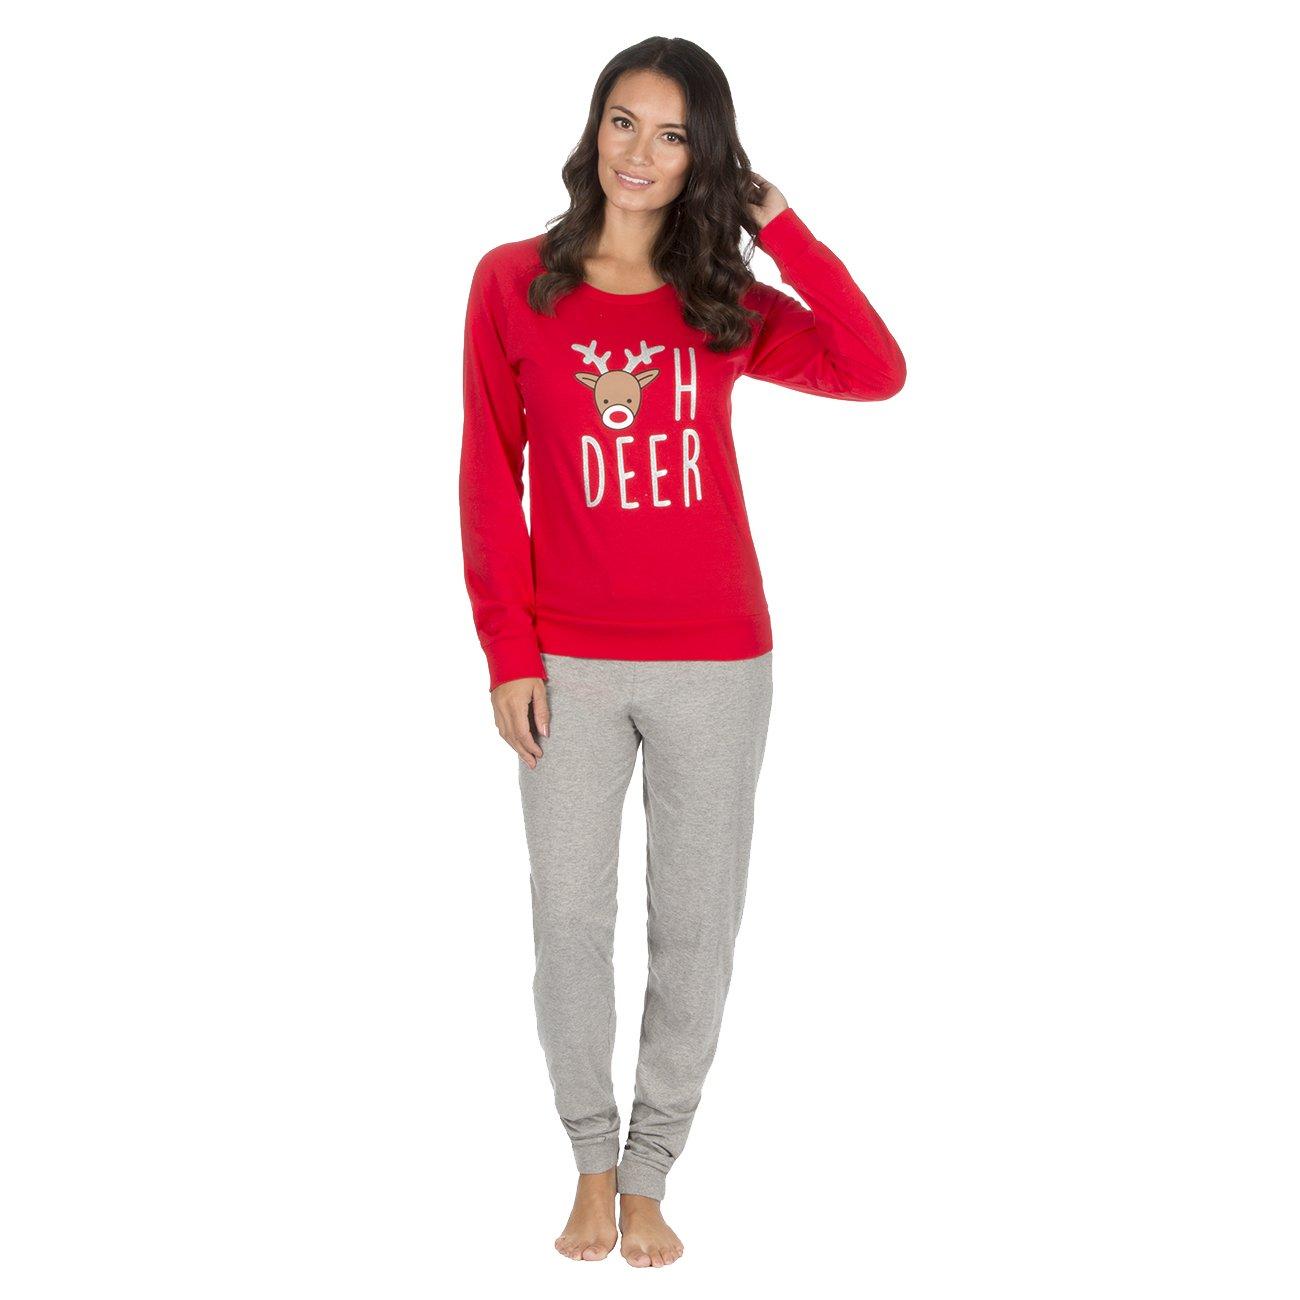 Forever Dreaming Womens Novelty Xmas Pyjama Set - Cotton Christmas PJ Top & Bottoms